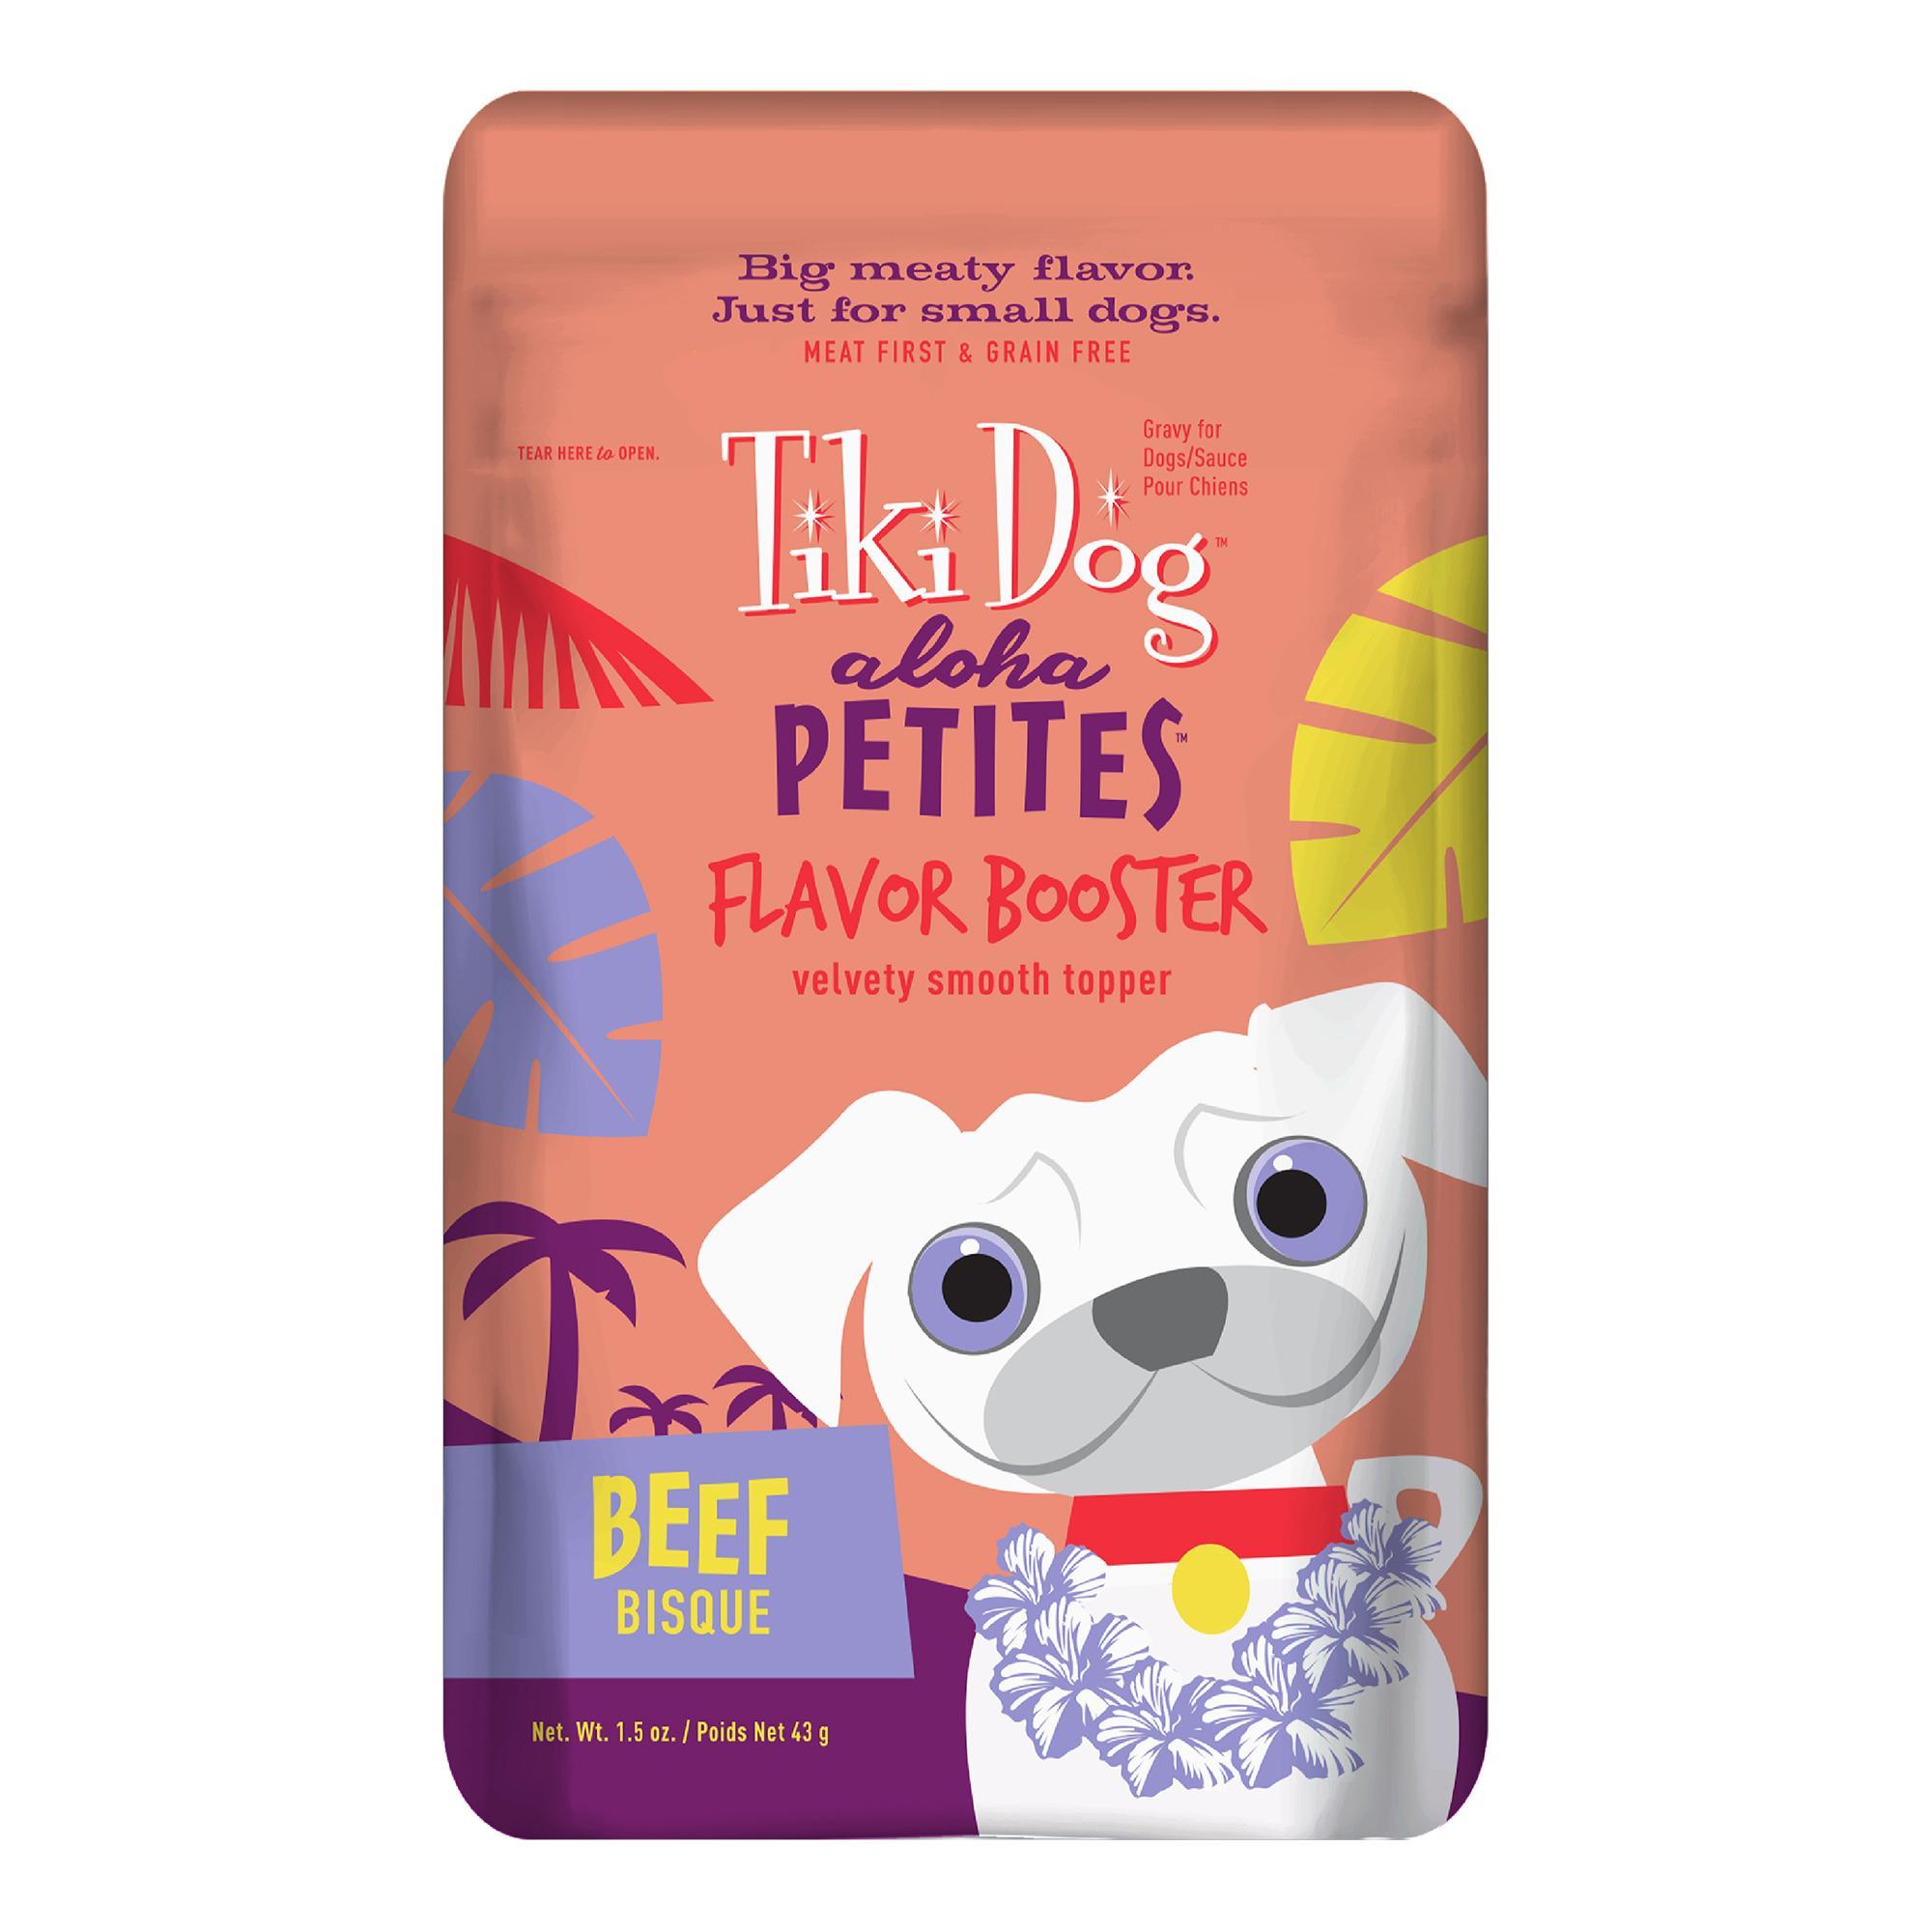 Tiki Dog Aloha Petites Flavor Booster Beef Bisque Dog Treat, 1.5-oz pouch